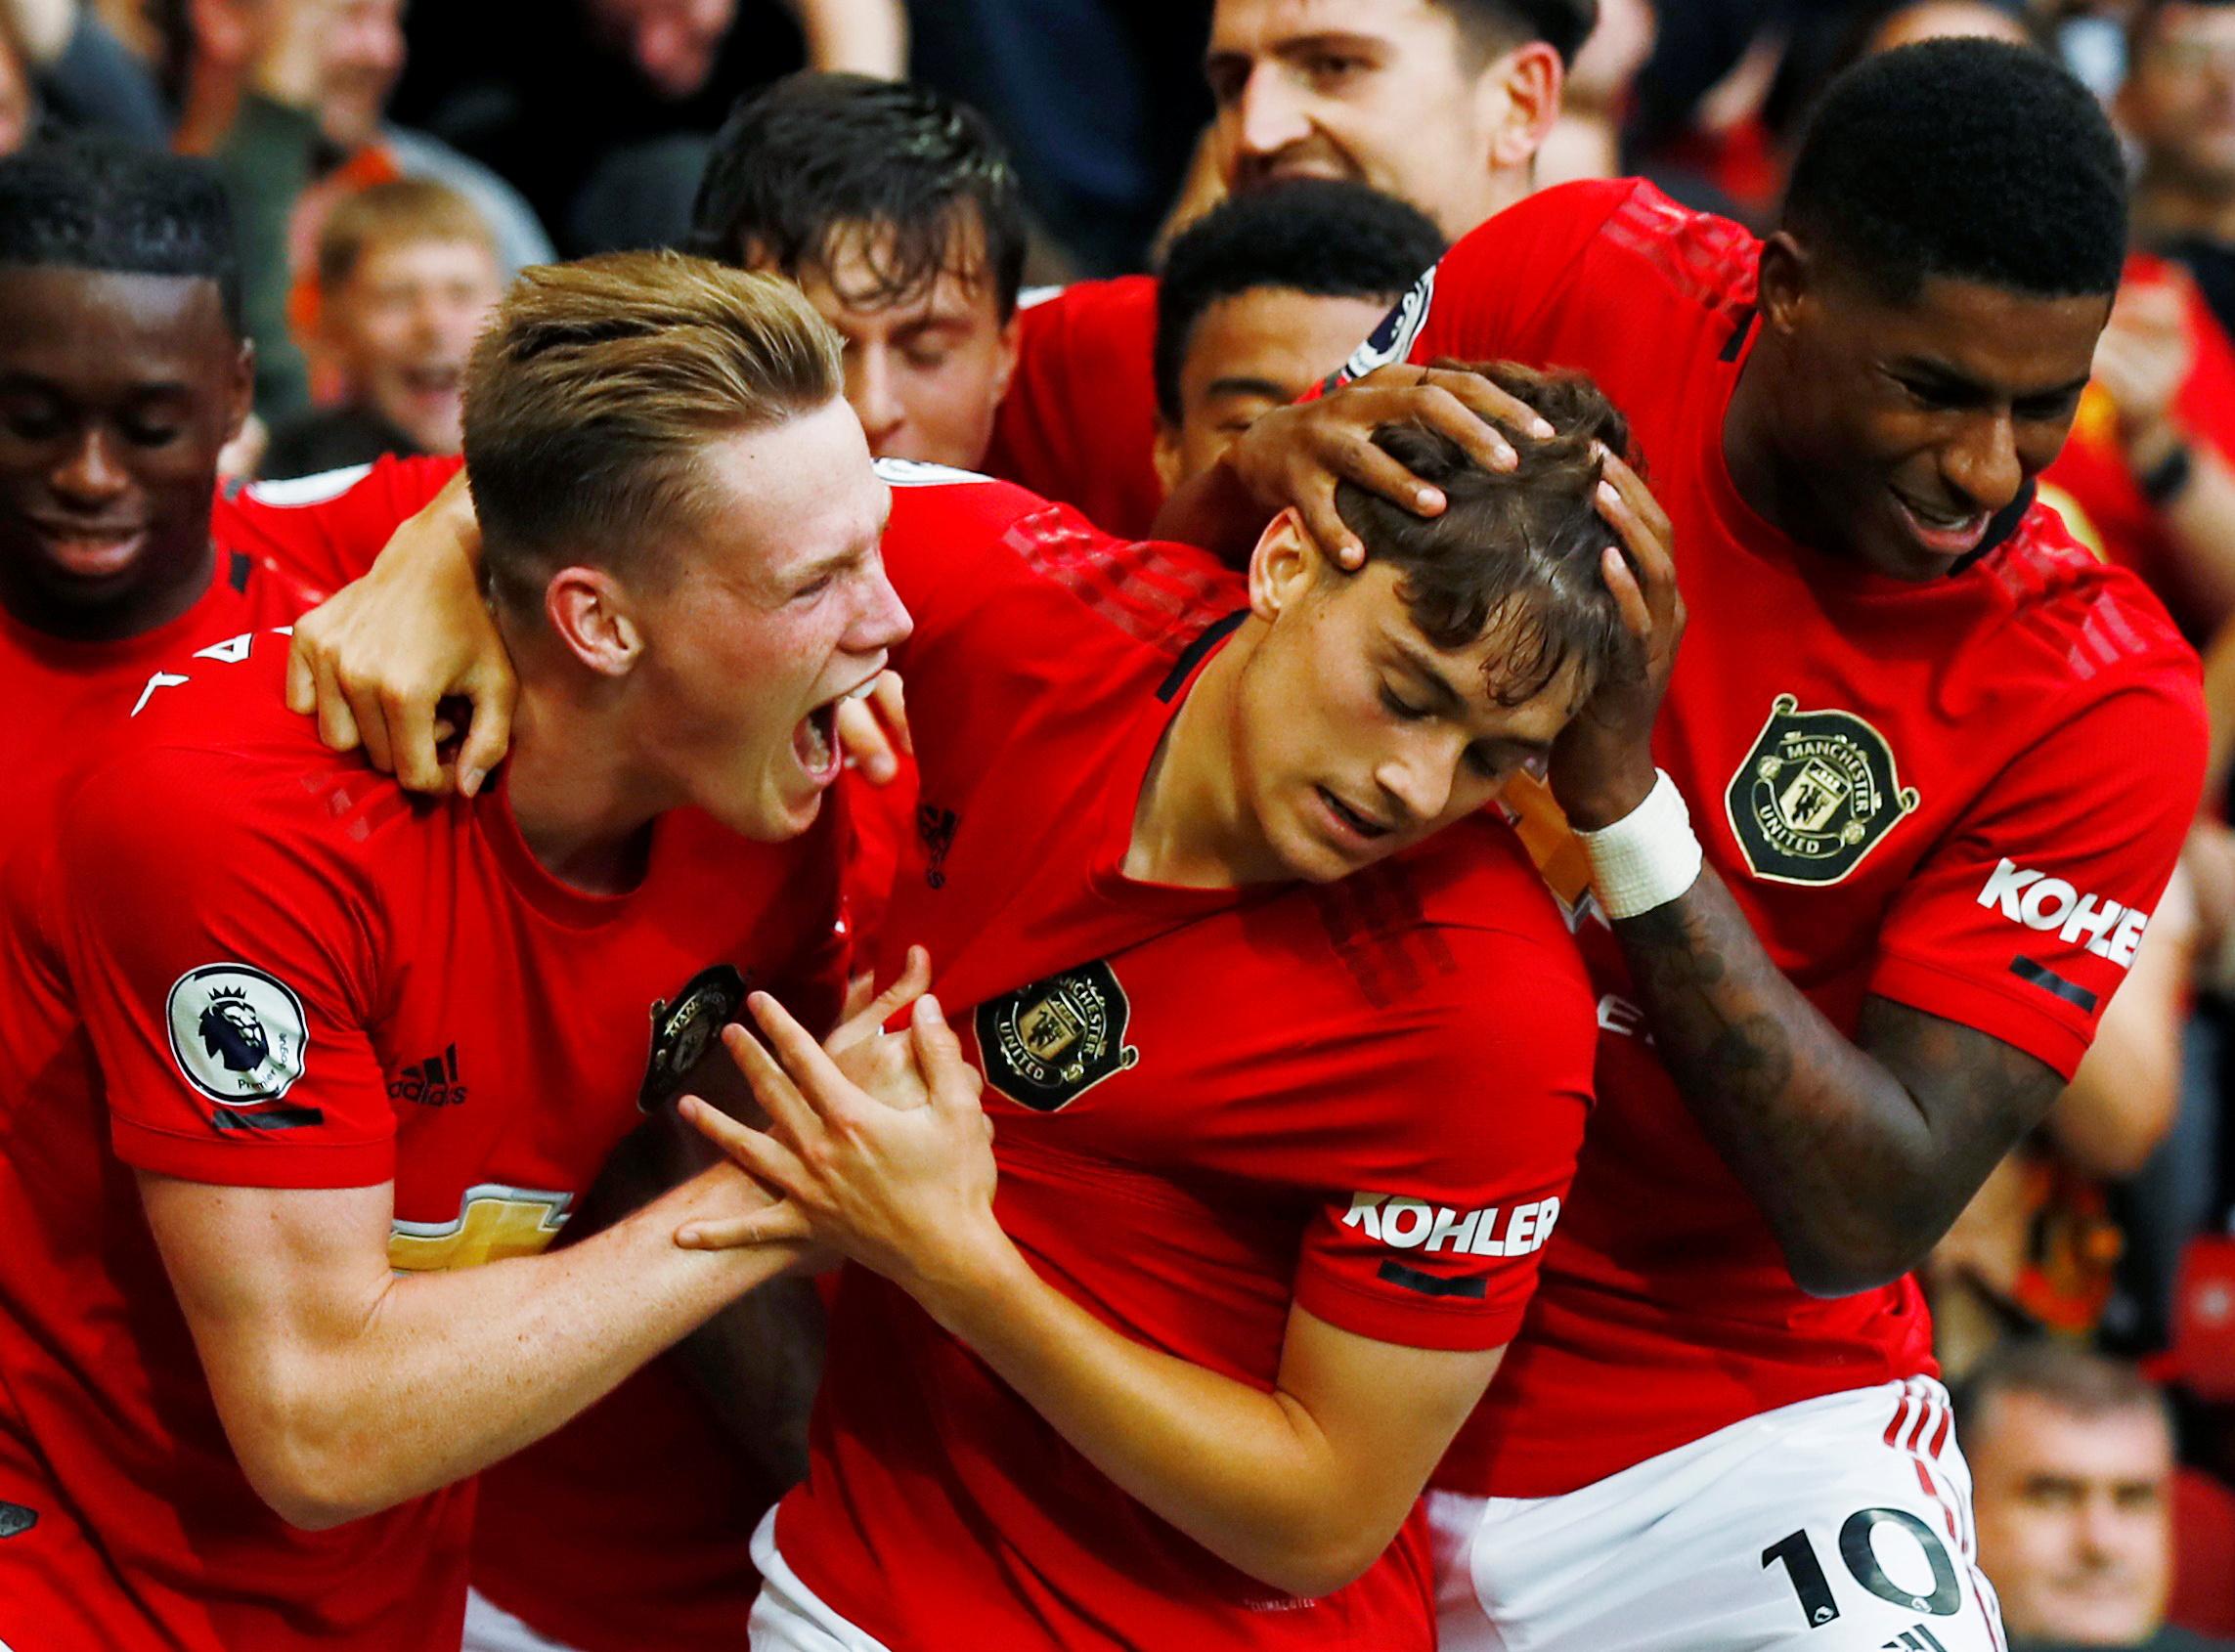 Daniel James and Marcus Rashford form an impressive training partnership